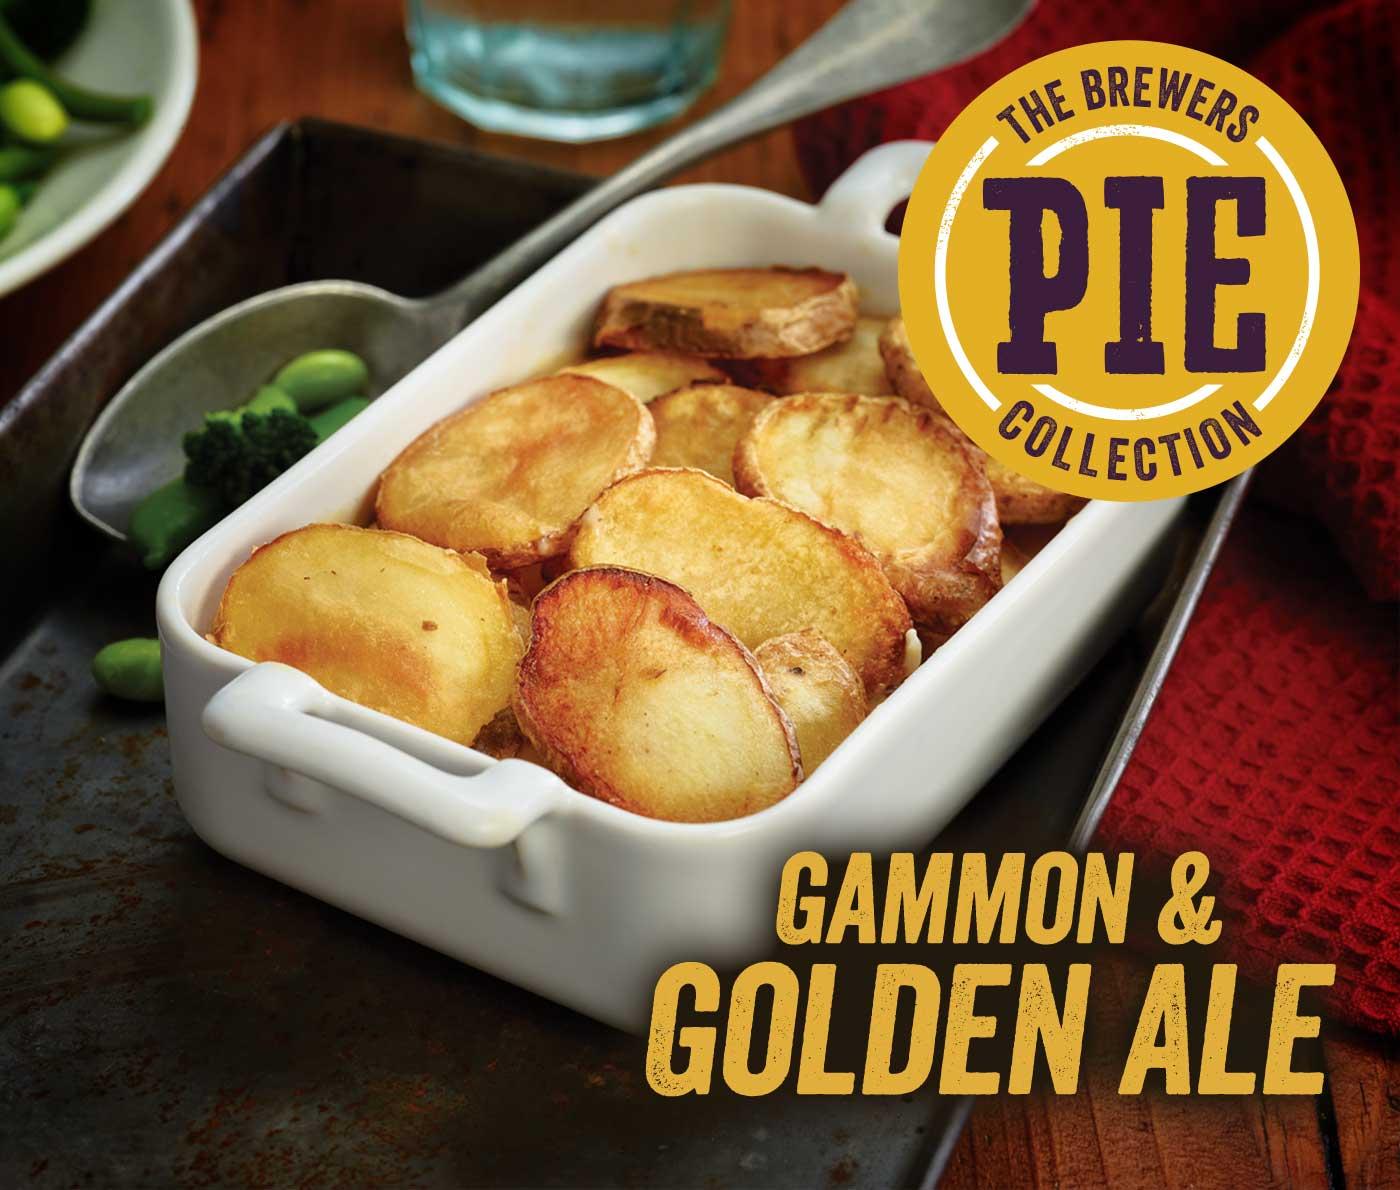 GAMMON & GOLDEN ALE